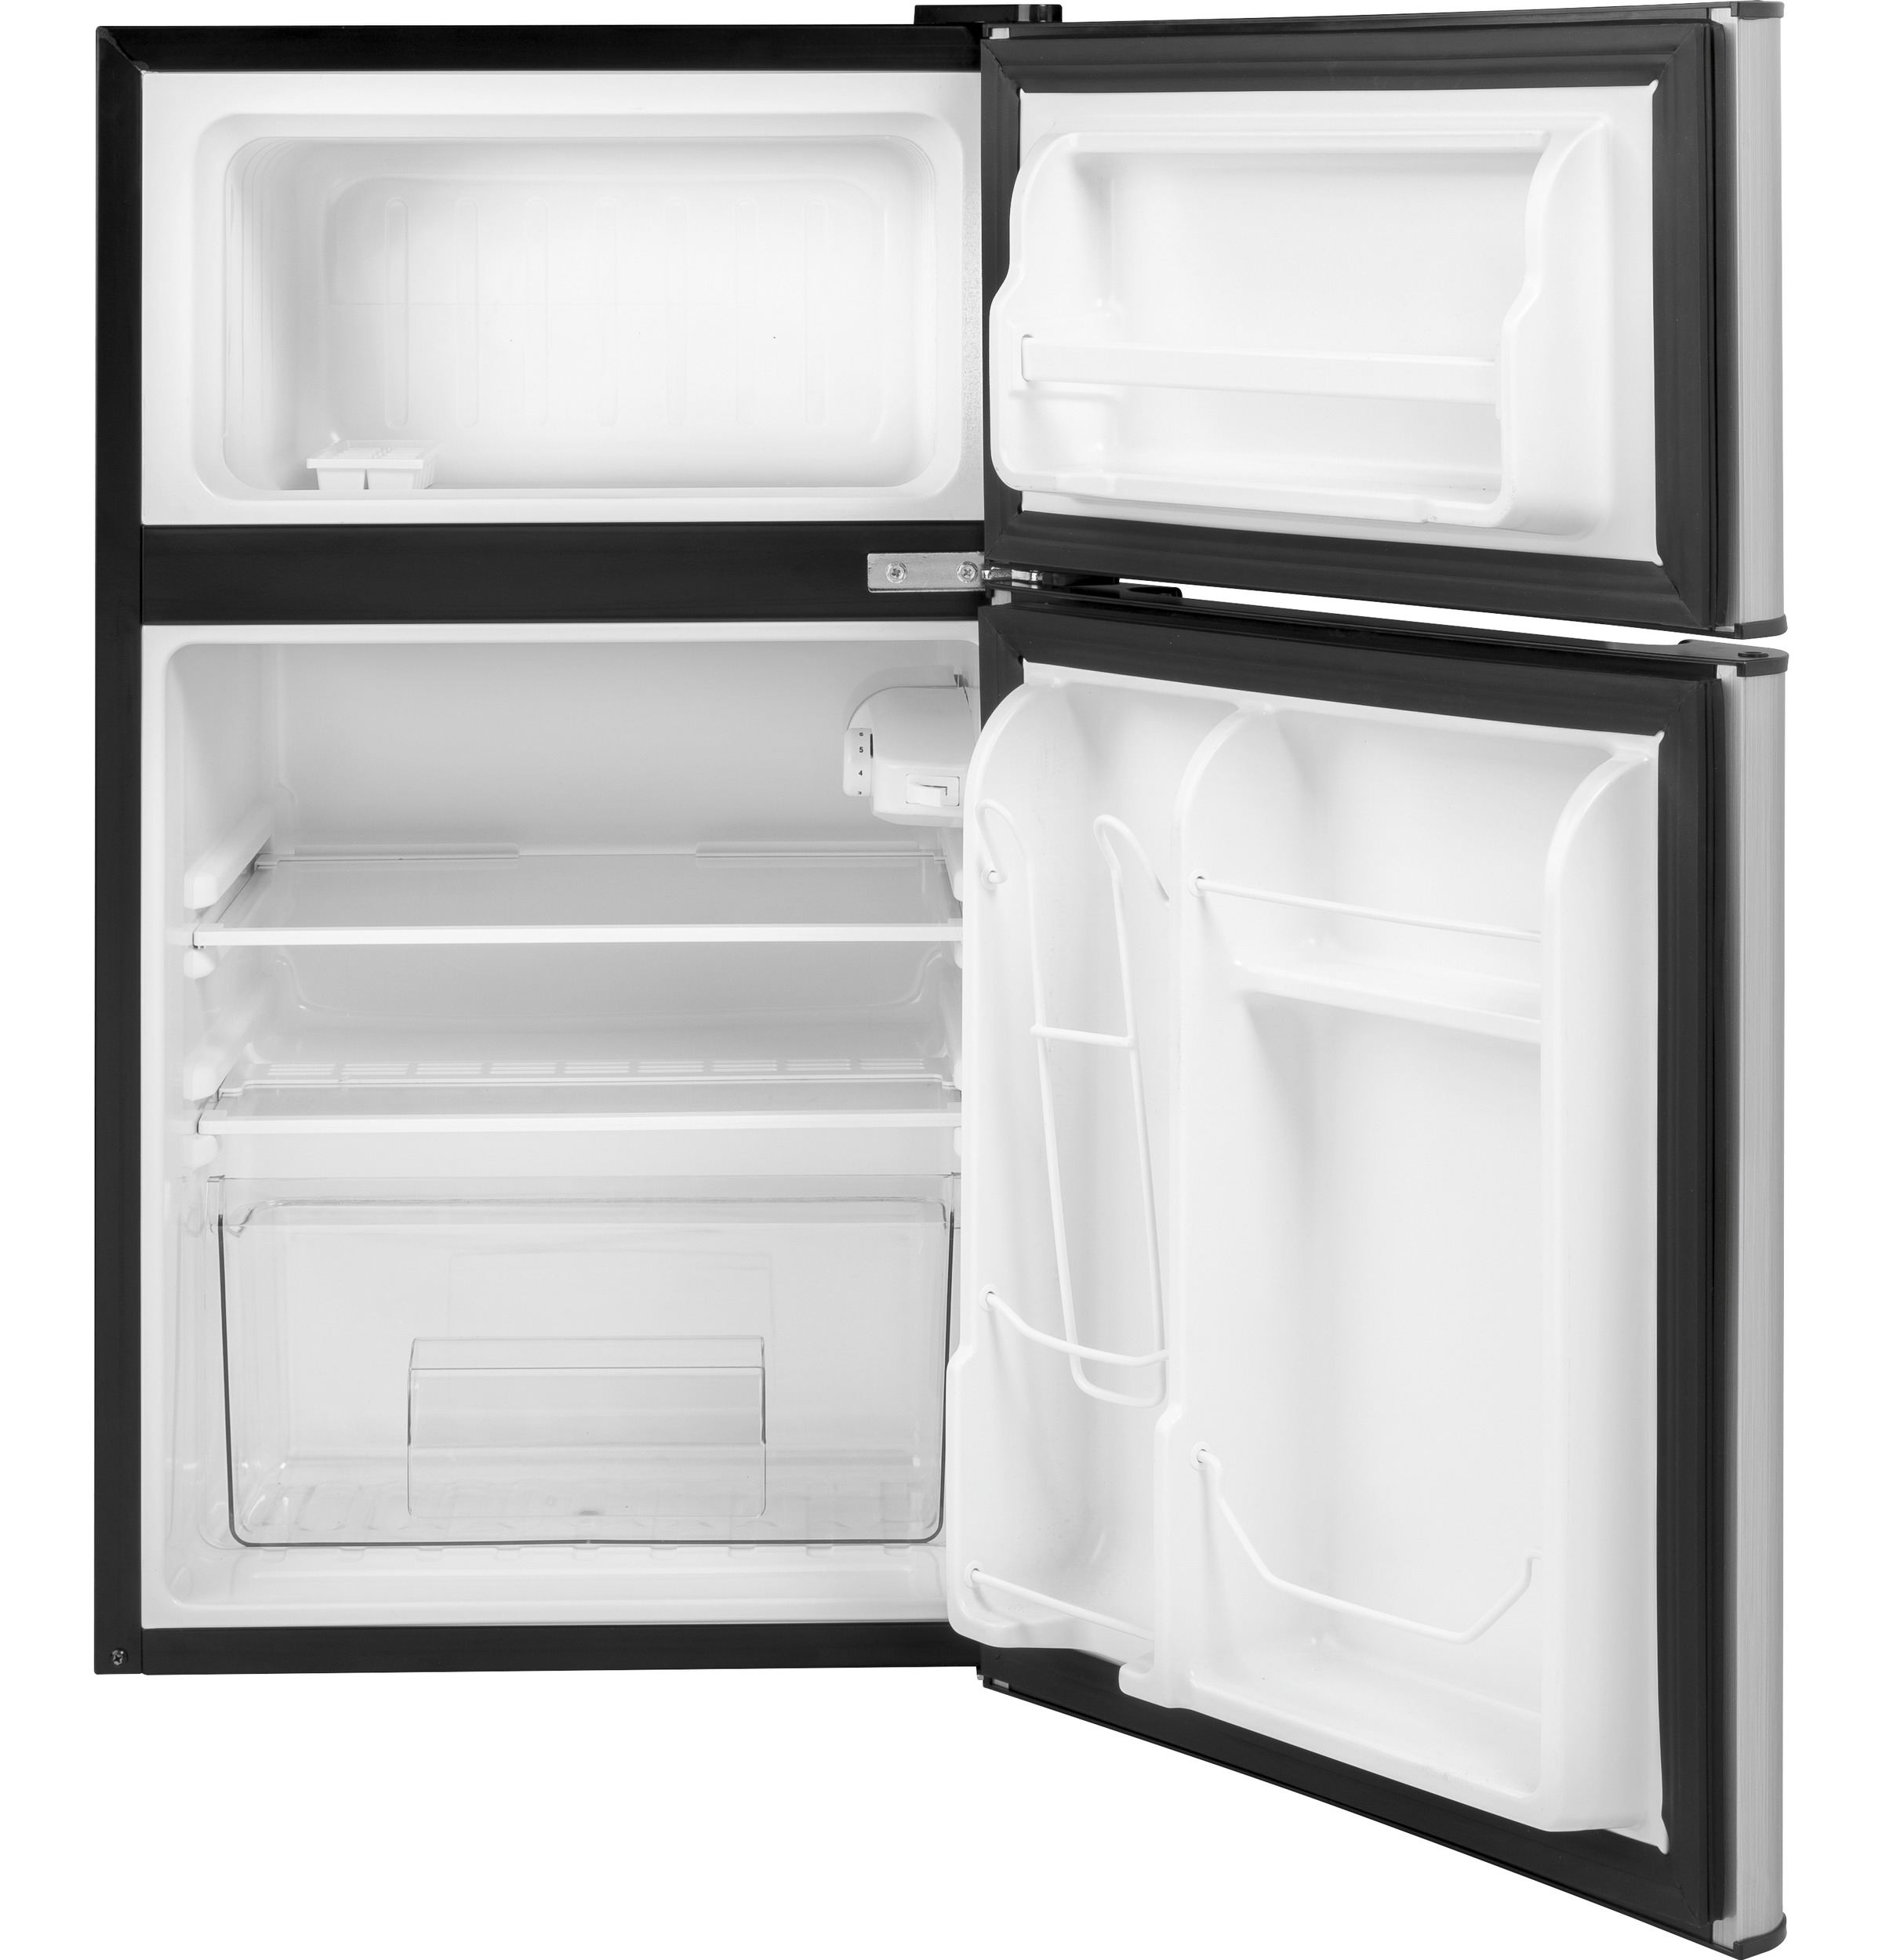 Model: HC32TW10SV | 3.2 Cu. Ft. Compact Refrigerator